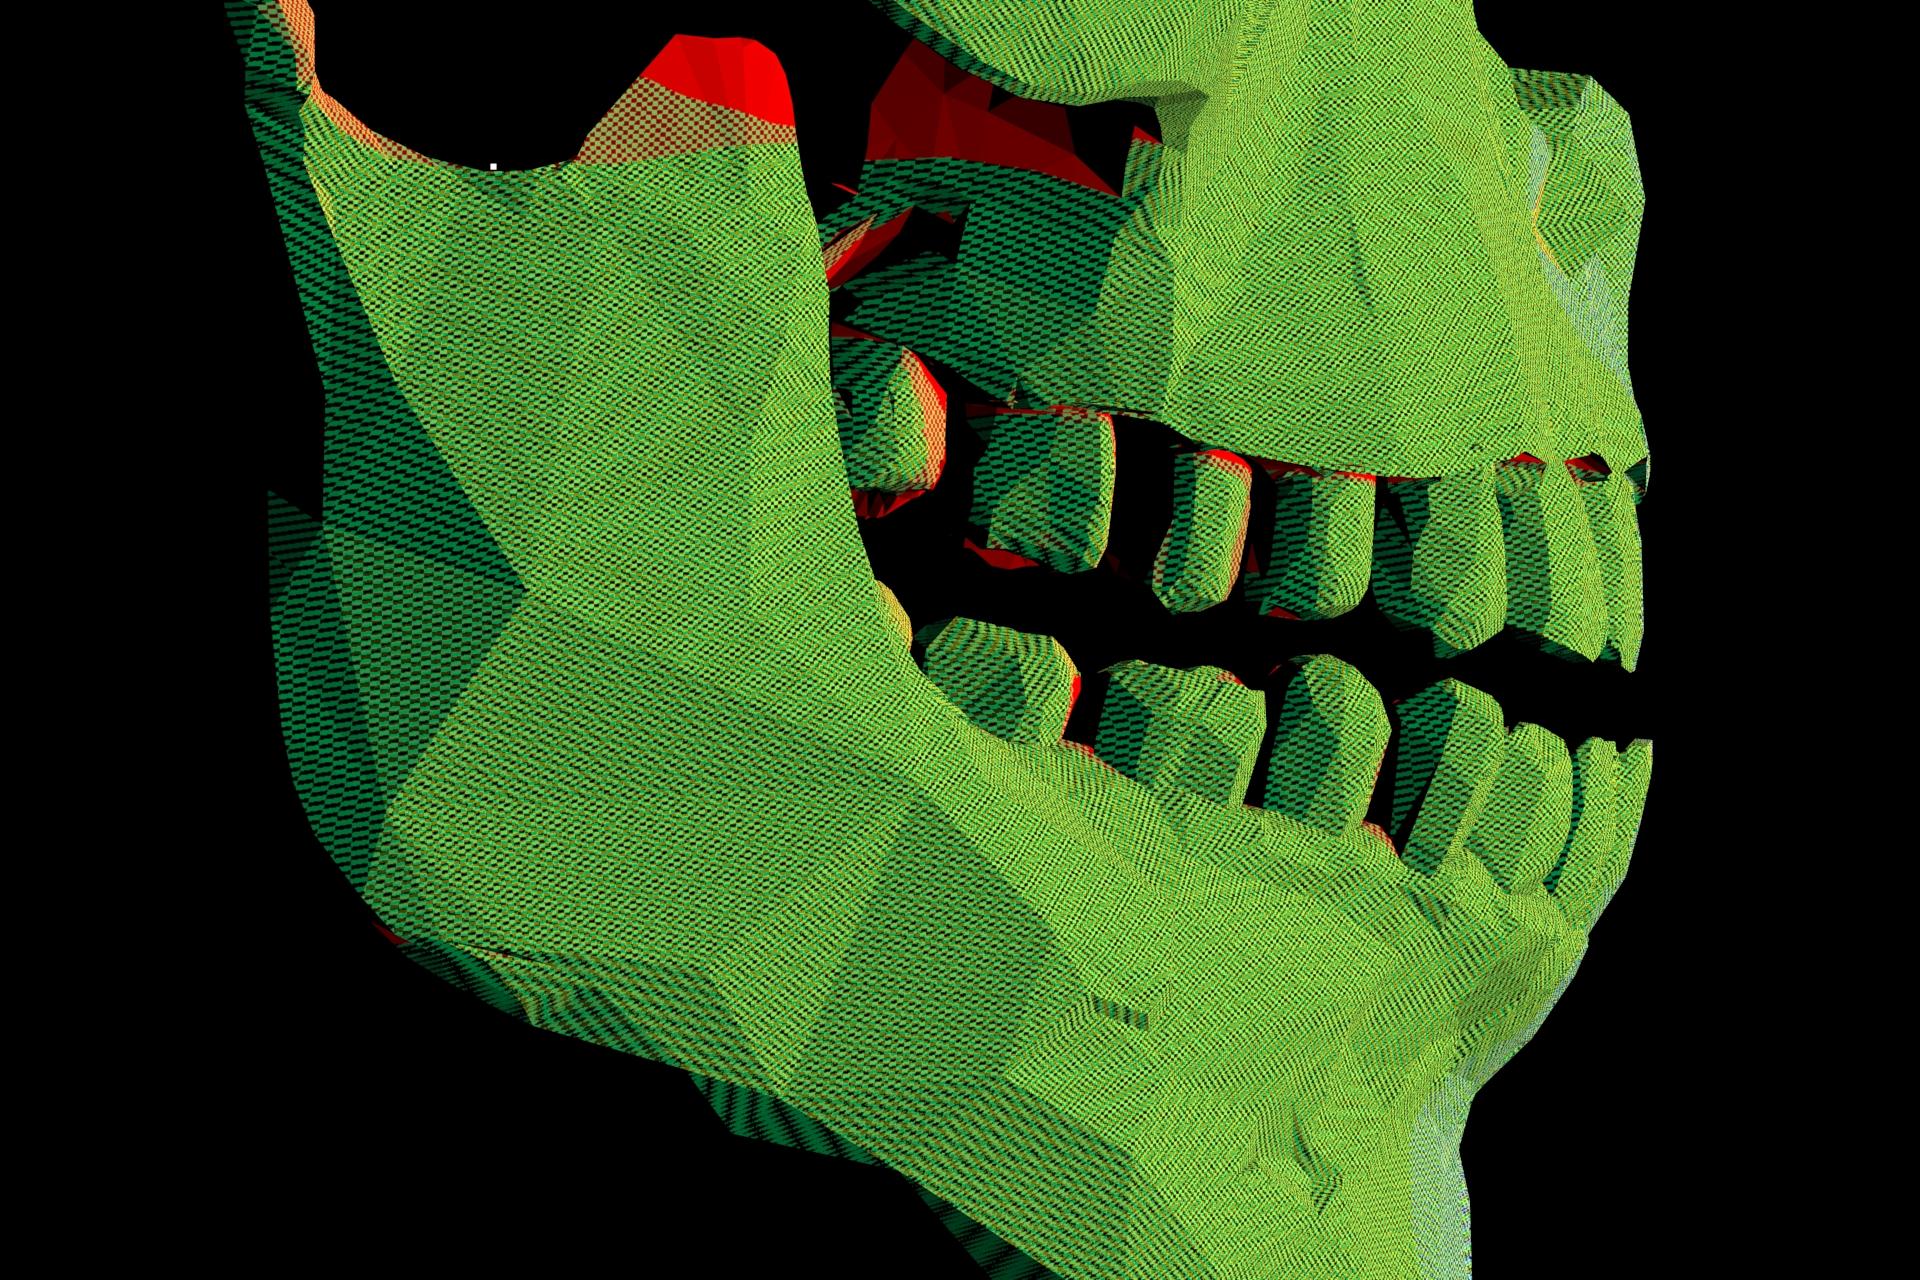 05_frontpictures-1.com-blog-max-barskih-skull